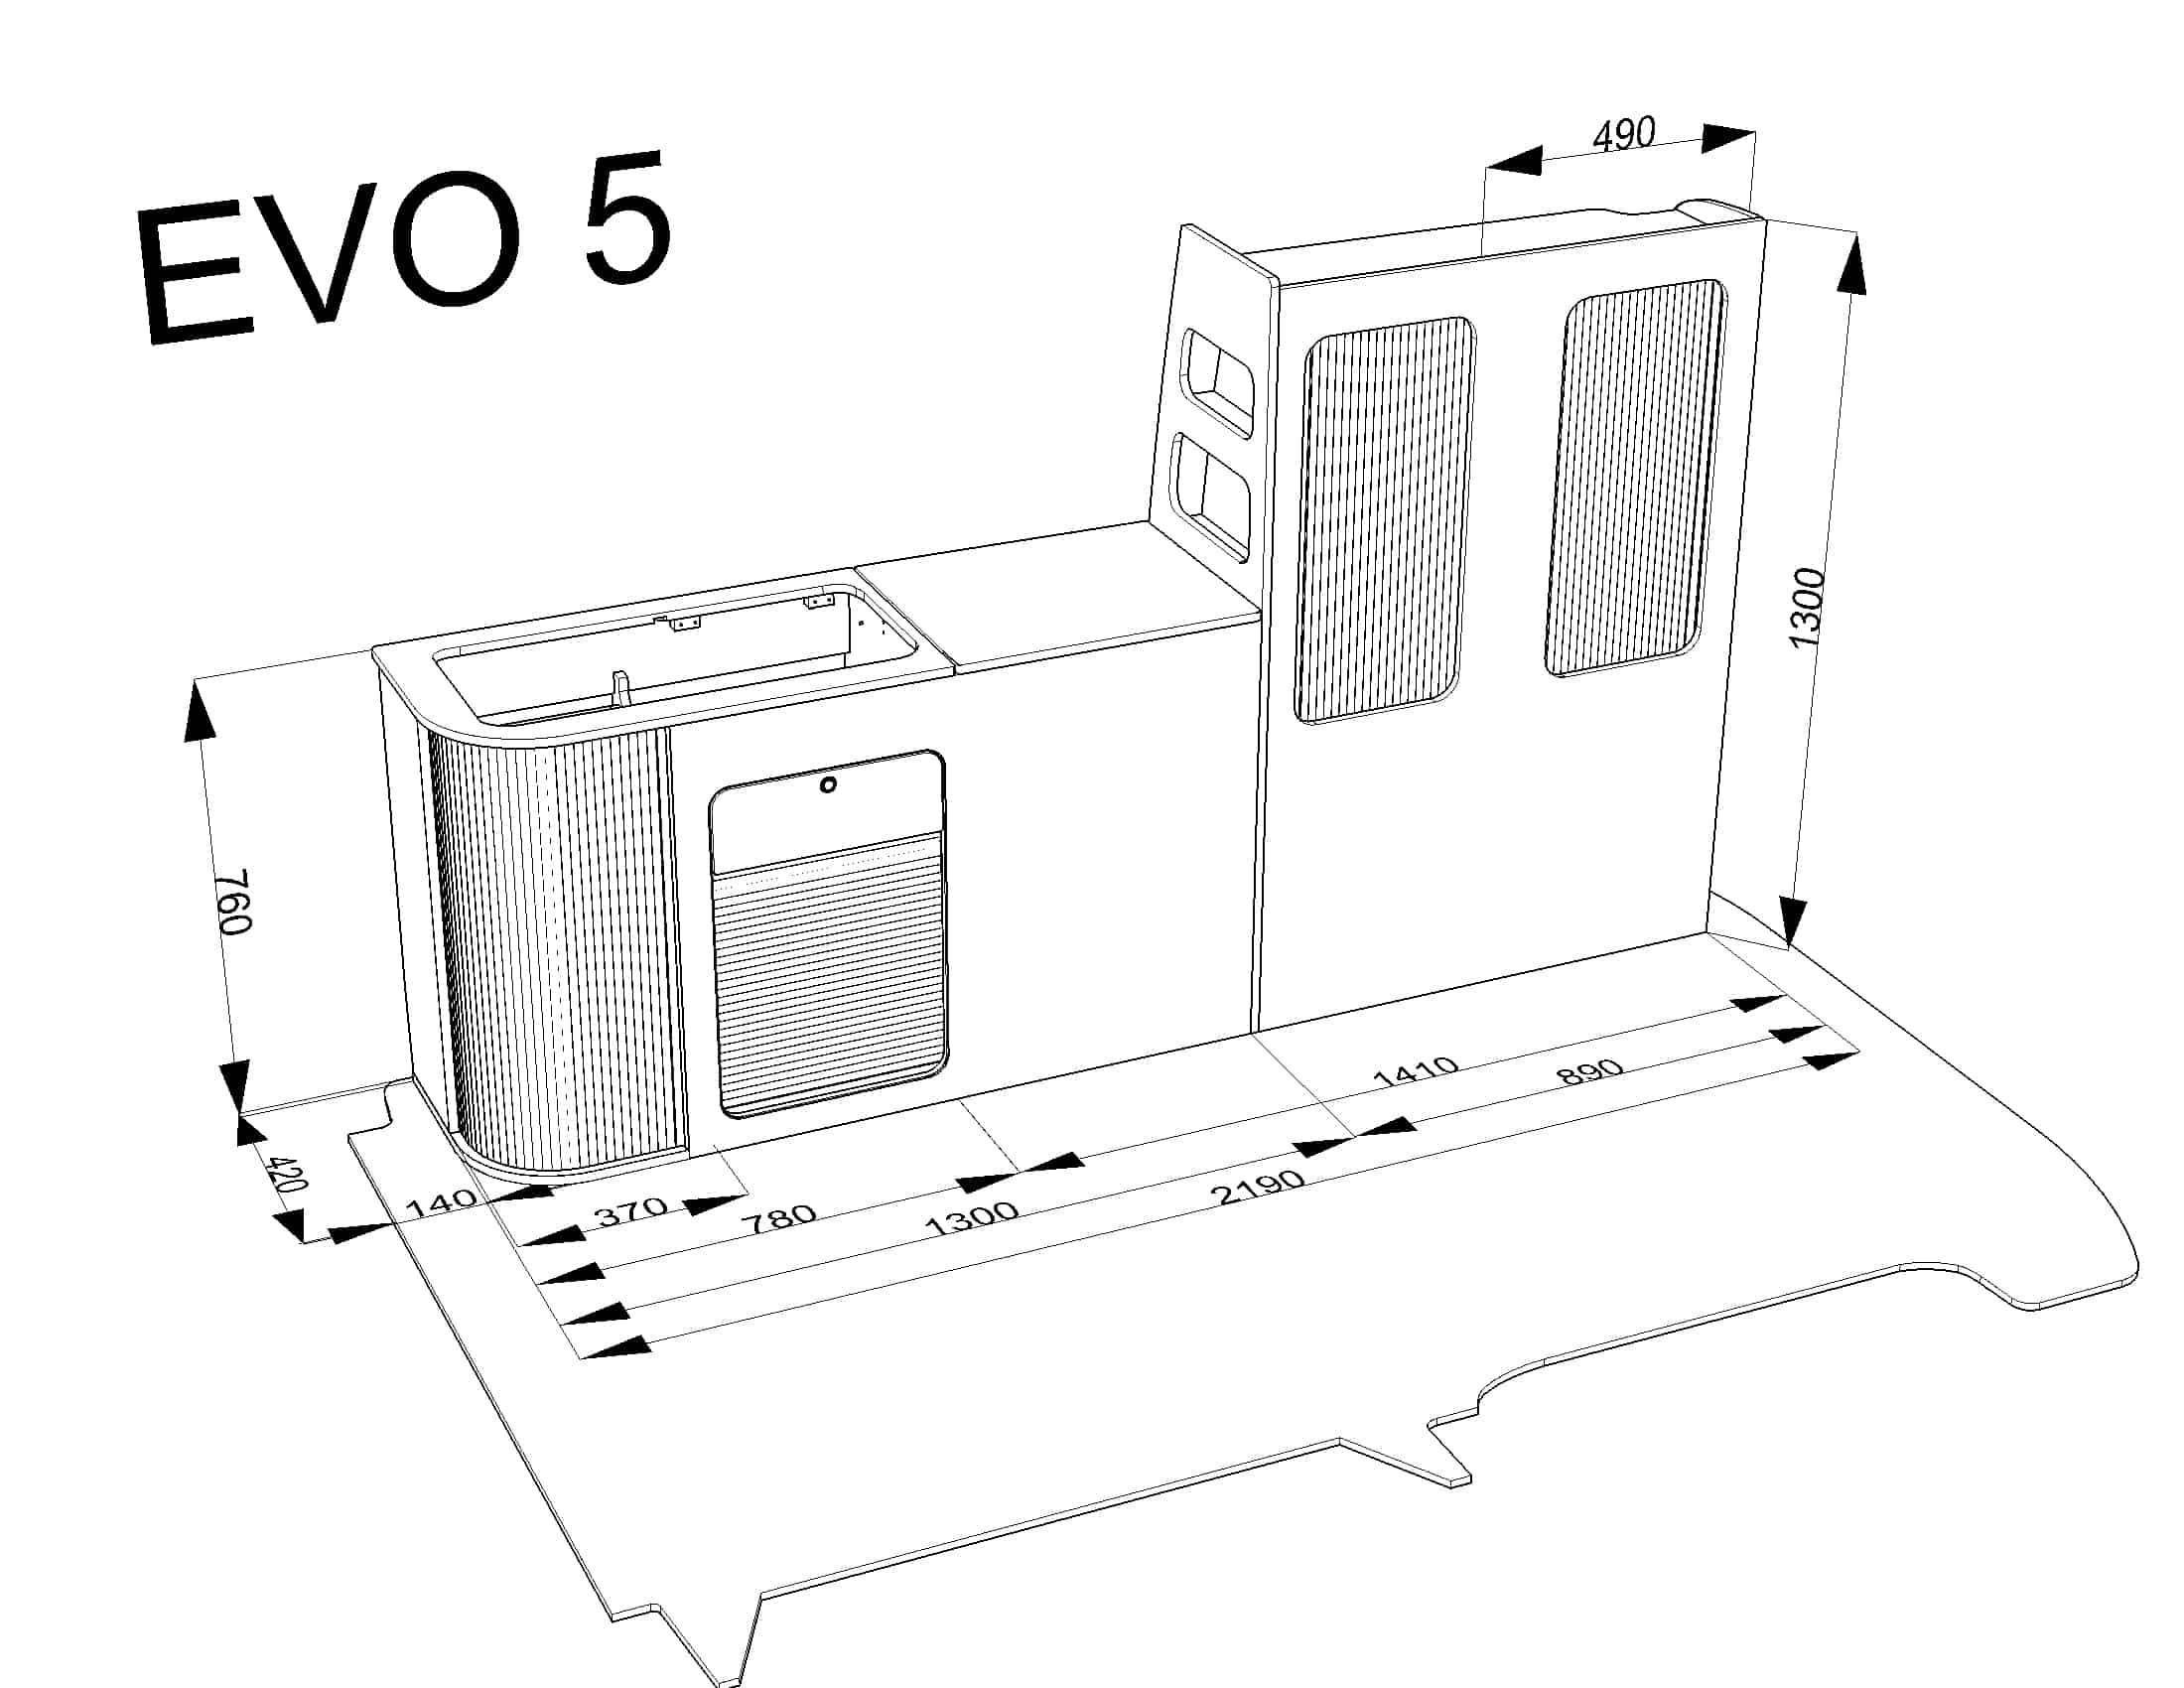 Evo 5 4 Swb Curved Kit T4 T5 T6